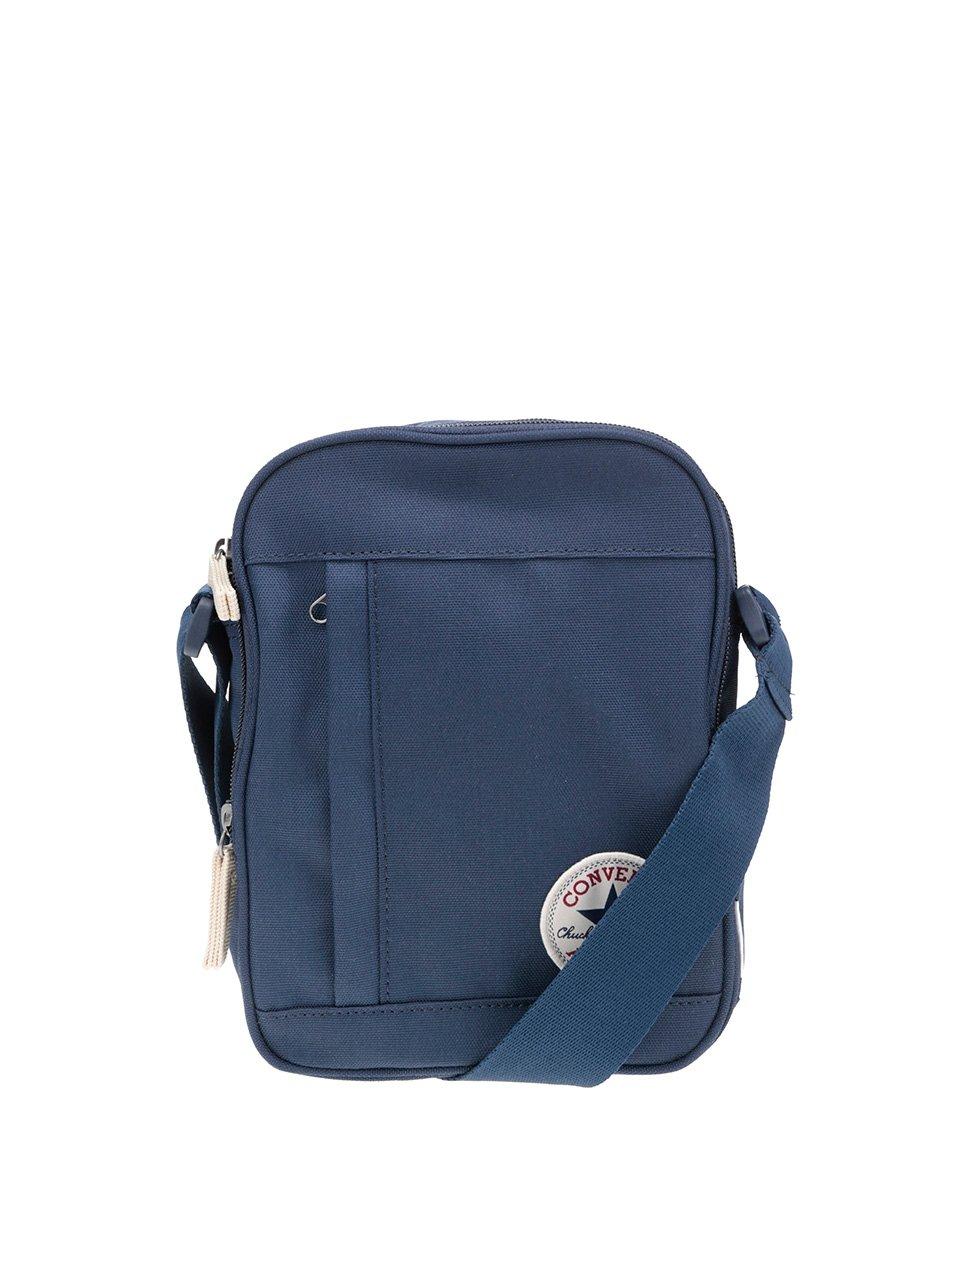 Tmavě modrá crossbody taška s logem Converse